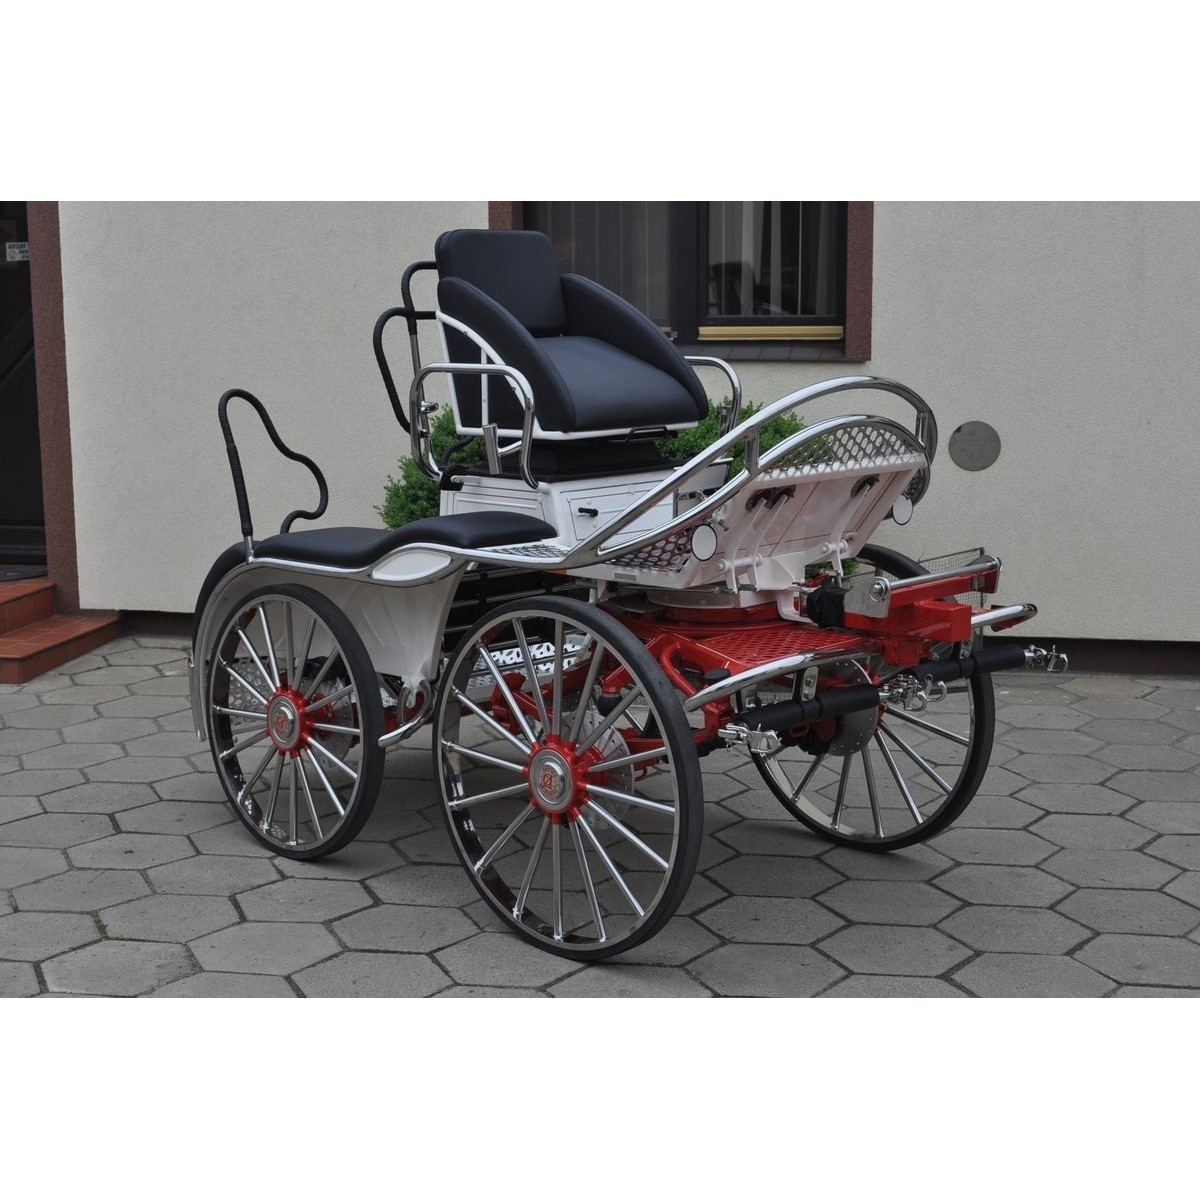 voiture hippomobile pour atteler 4 chevaux attelage. Black Bedroom Furniture Sets. Home Design Ideas